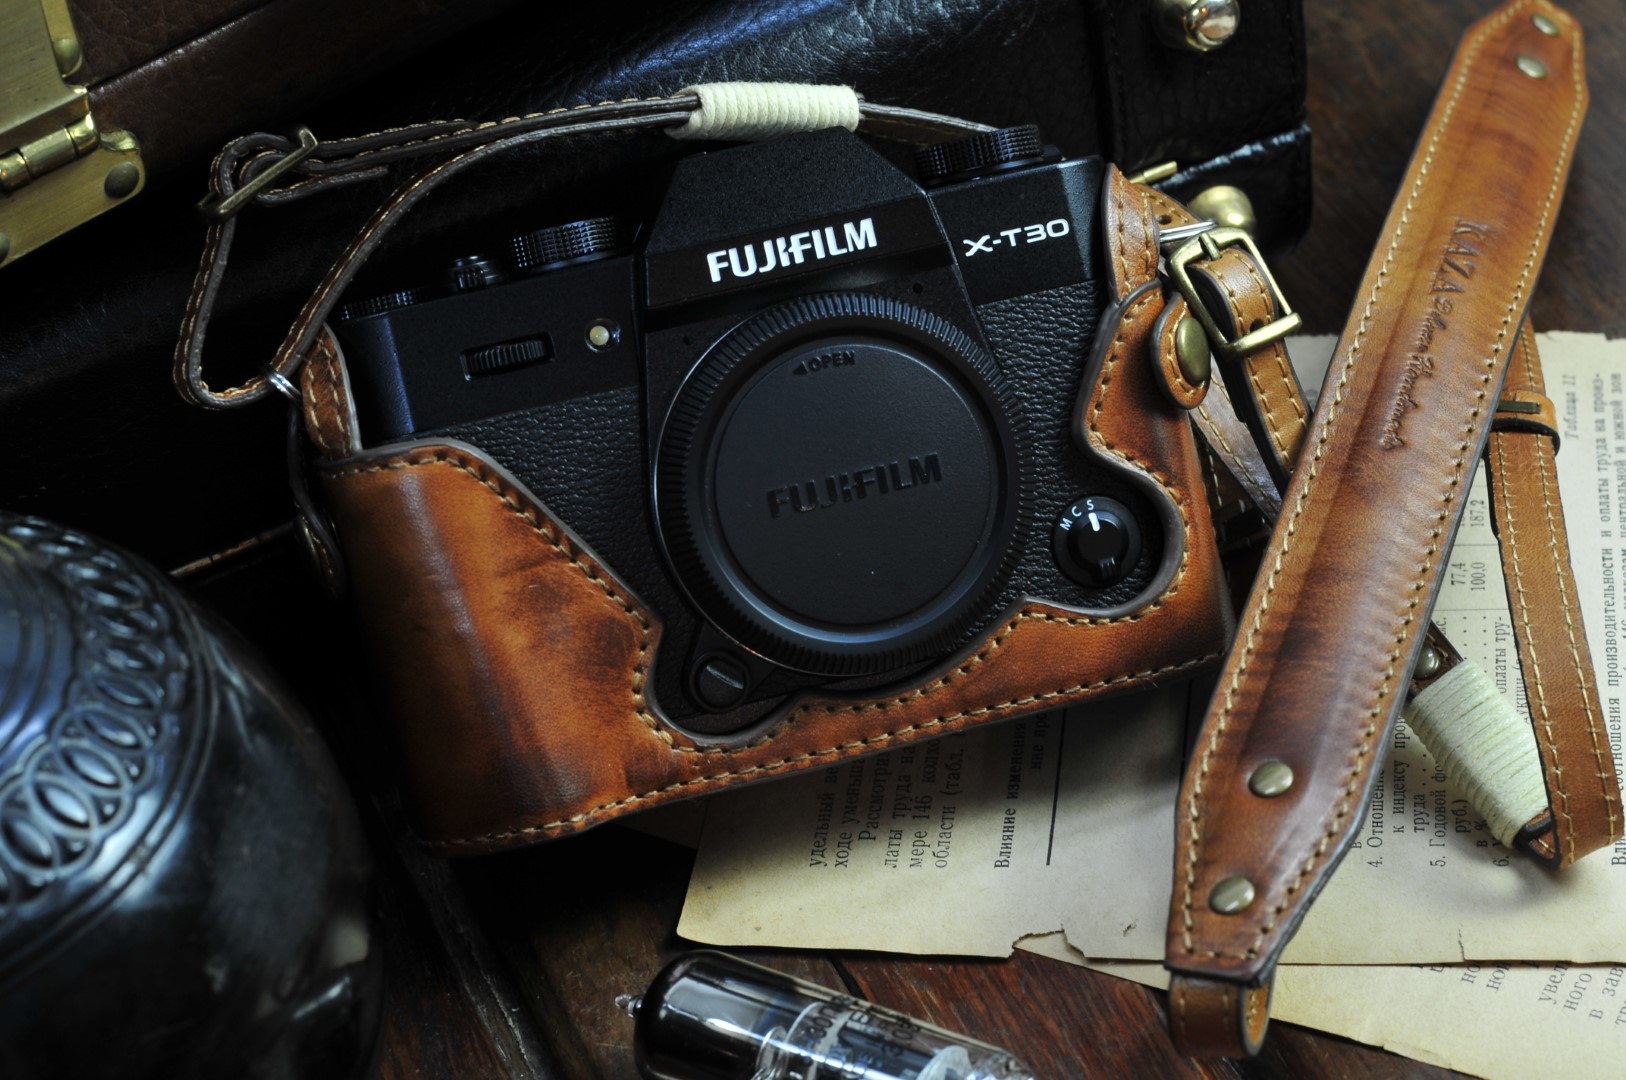 X-T30 leather half case, X-T30 half case, Xt30 camera case